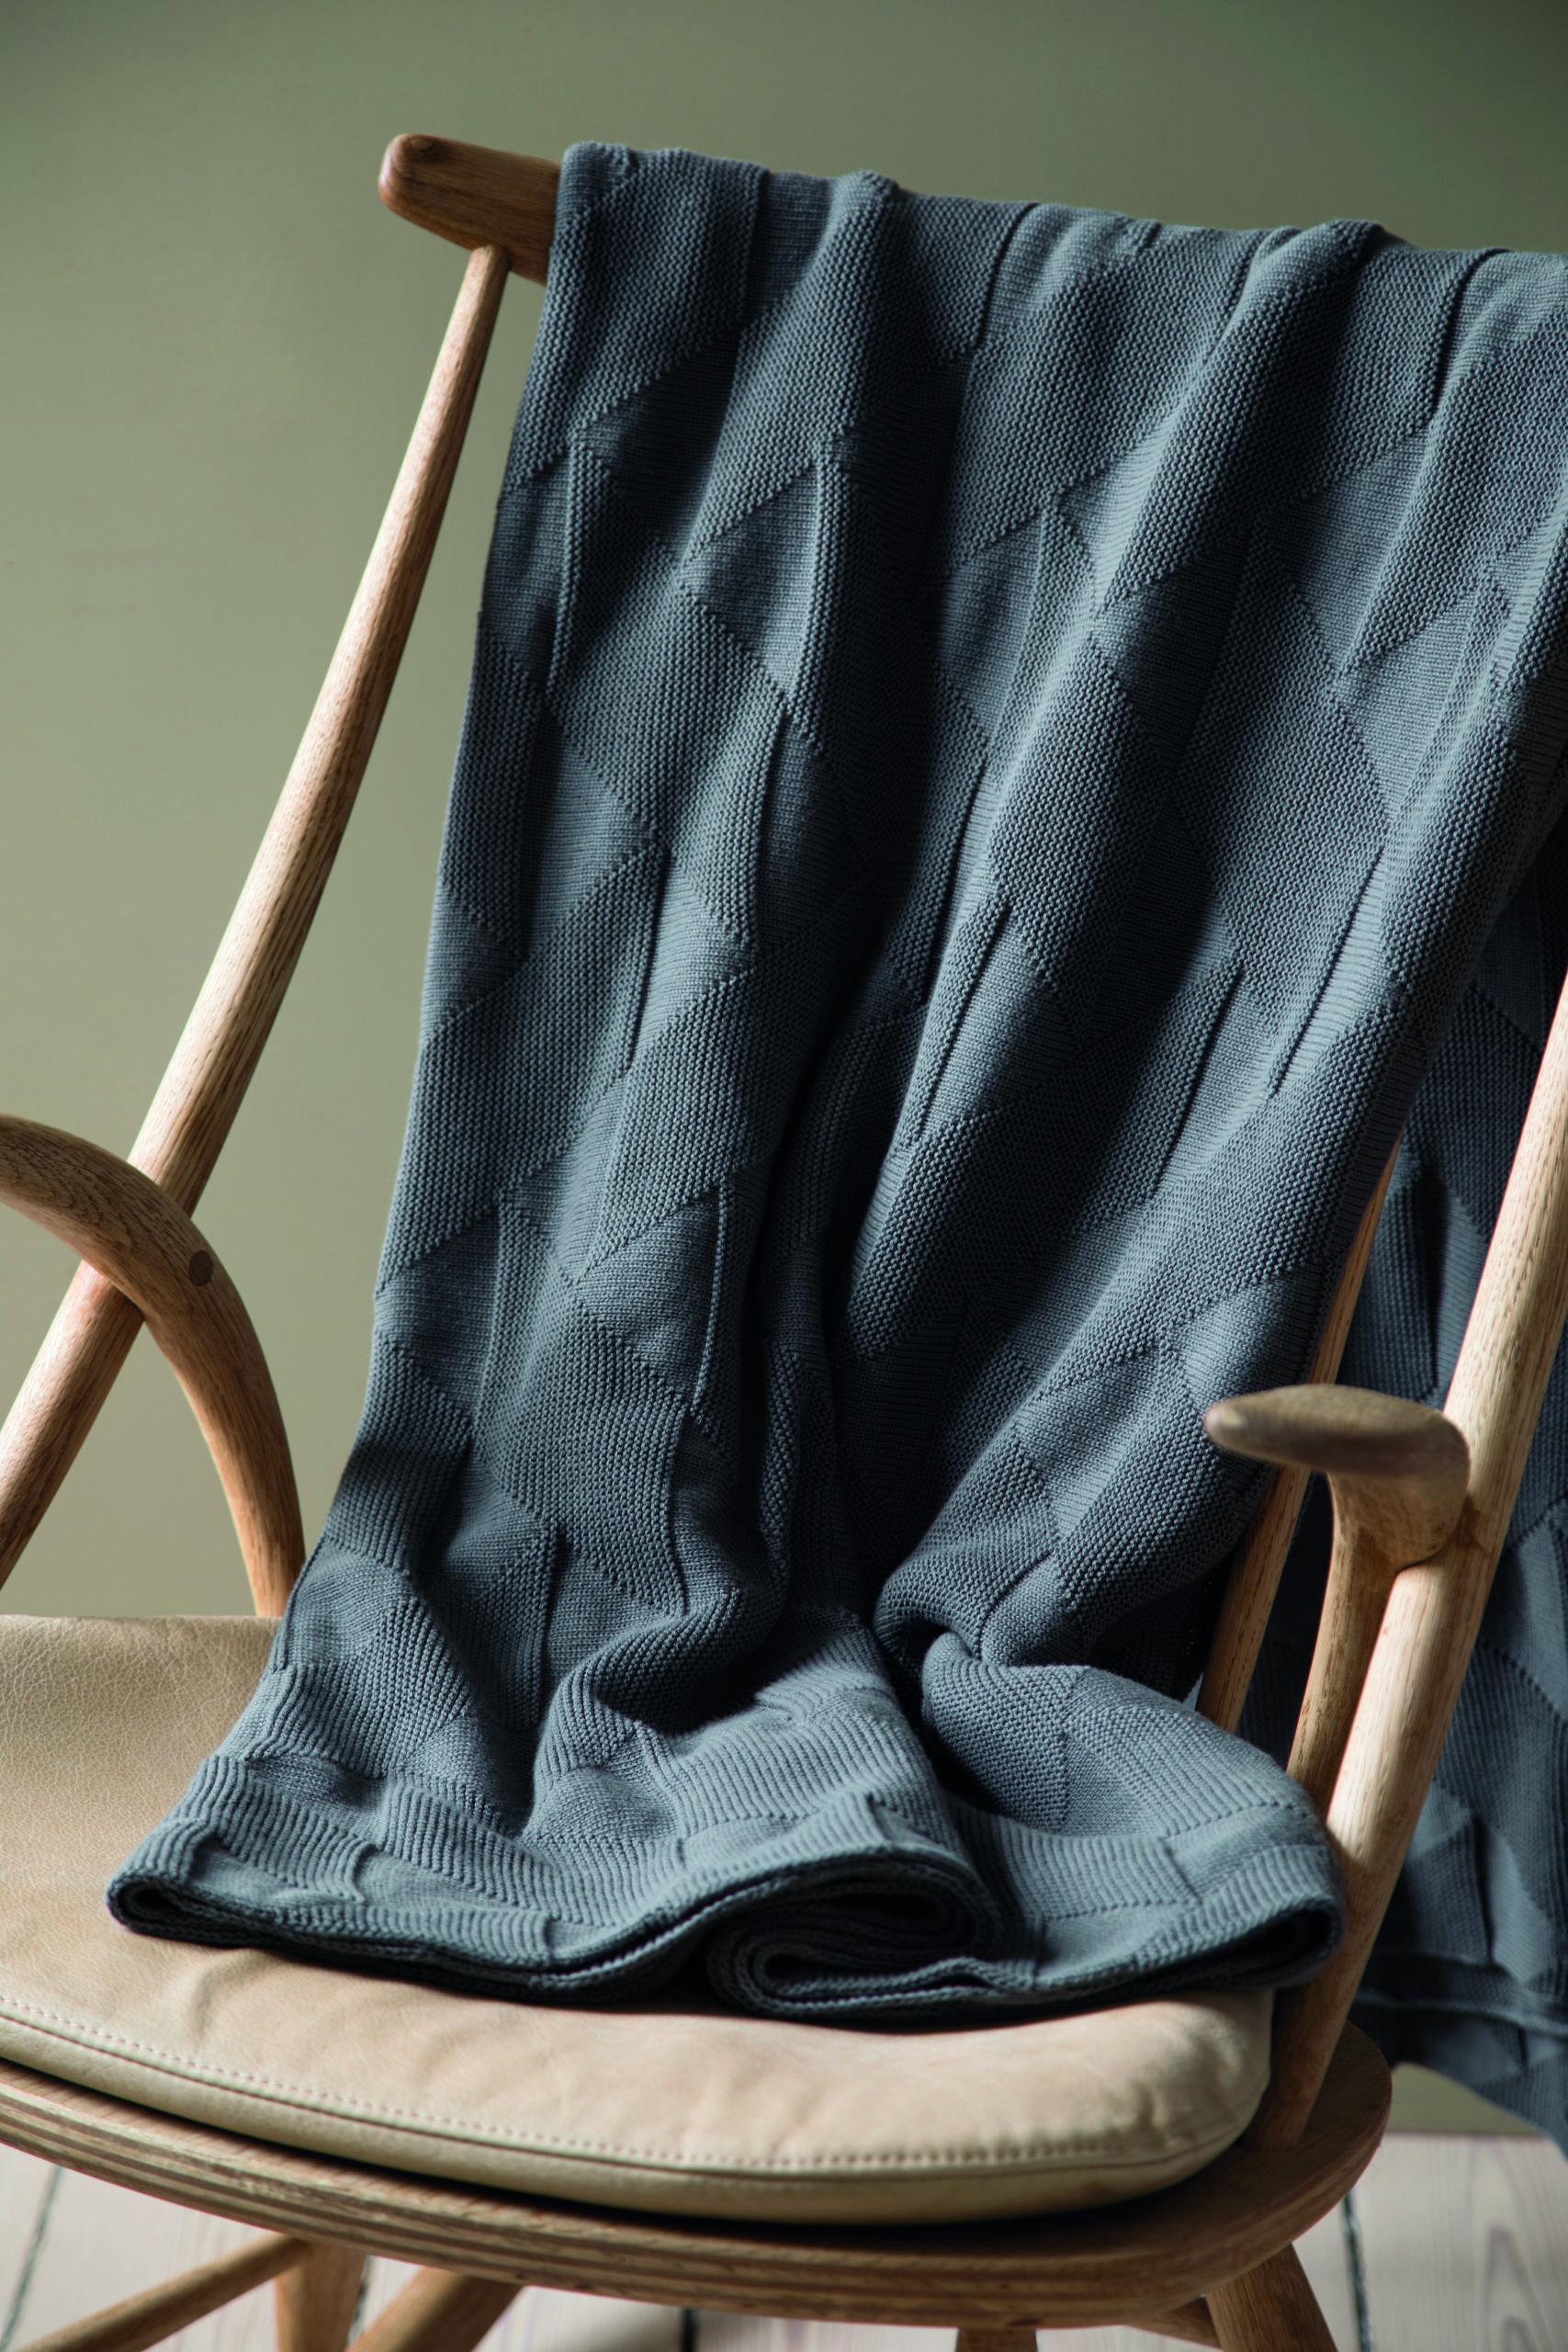 Architectmade-FJ-Pattern-Organic-Cotton-Pillows-Blankets-Denmark-Finn-Juhl-6